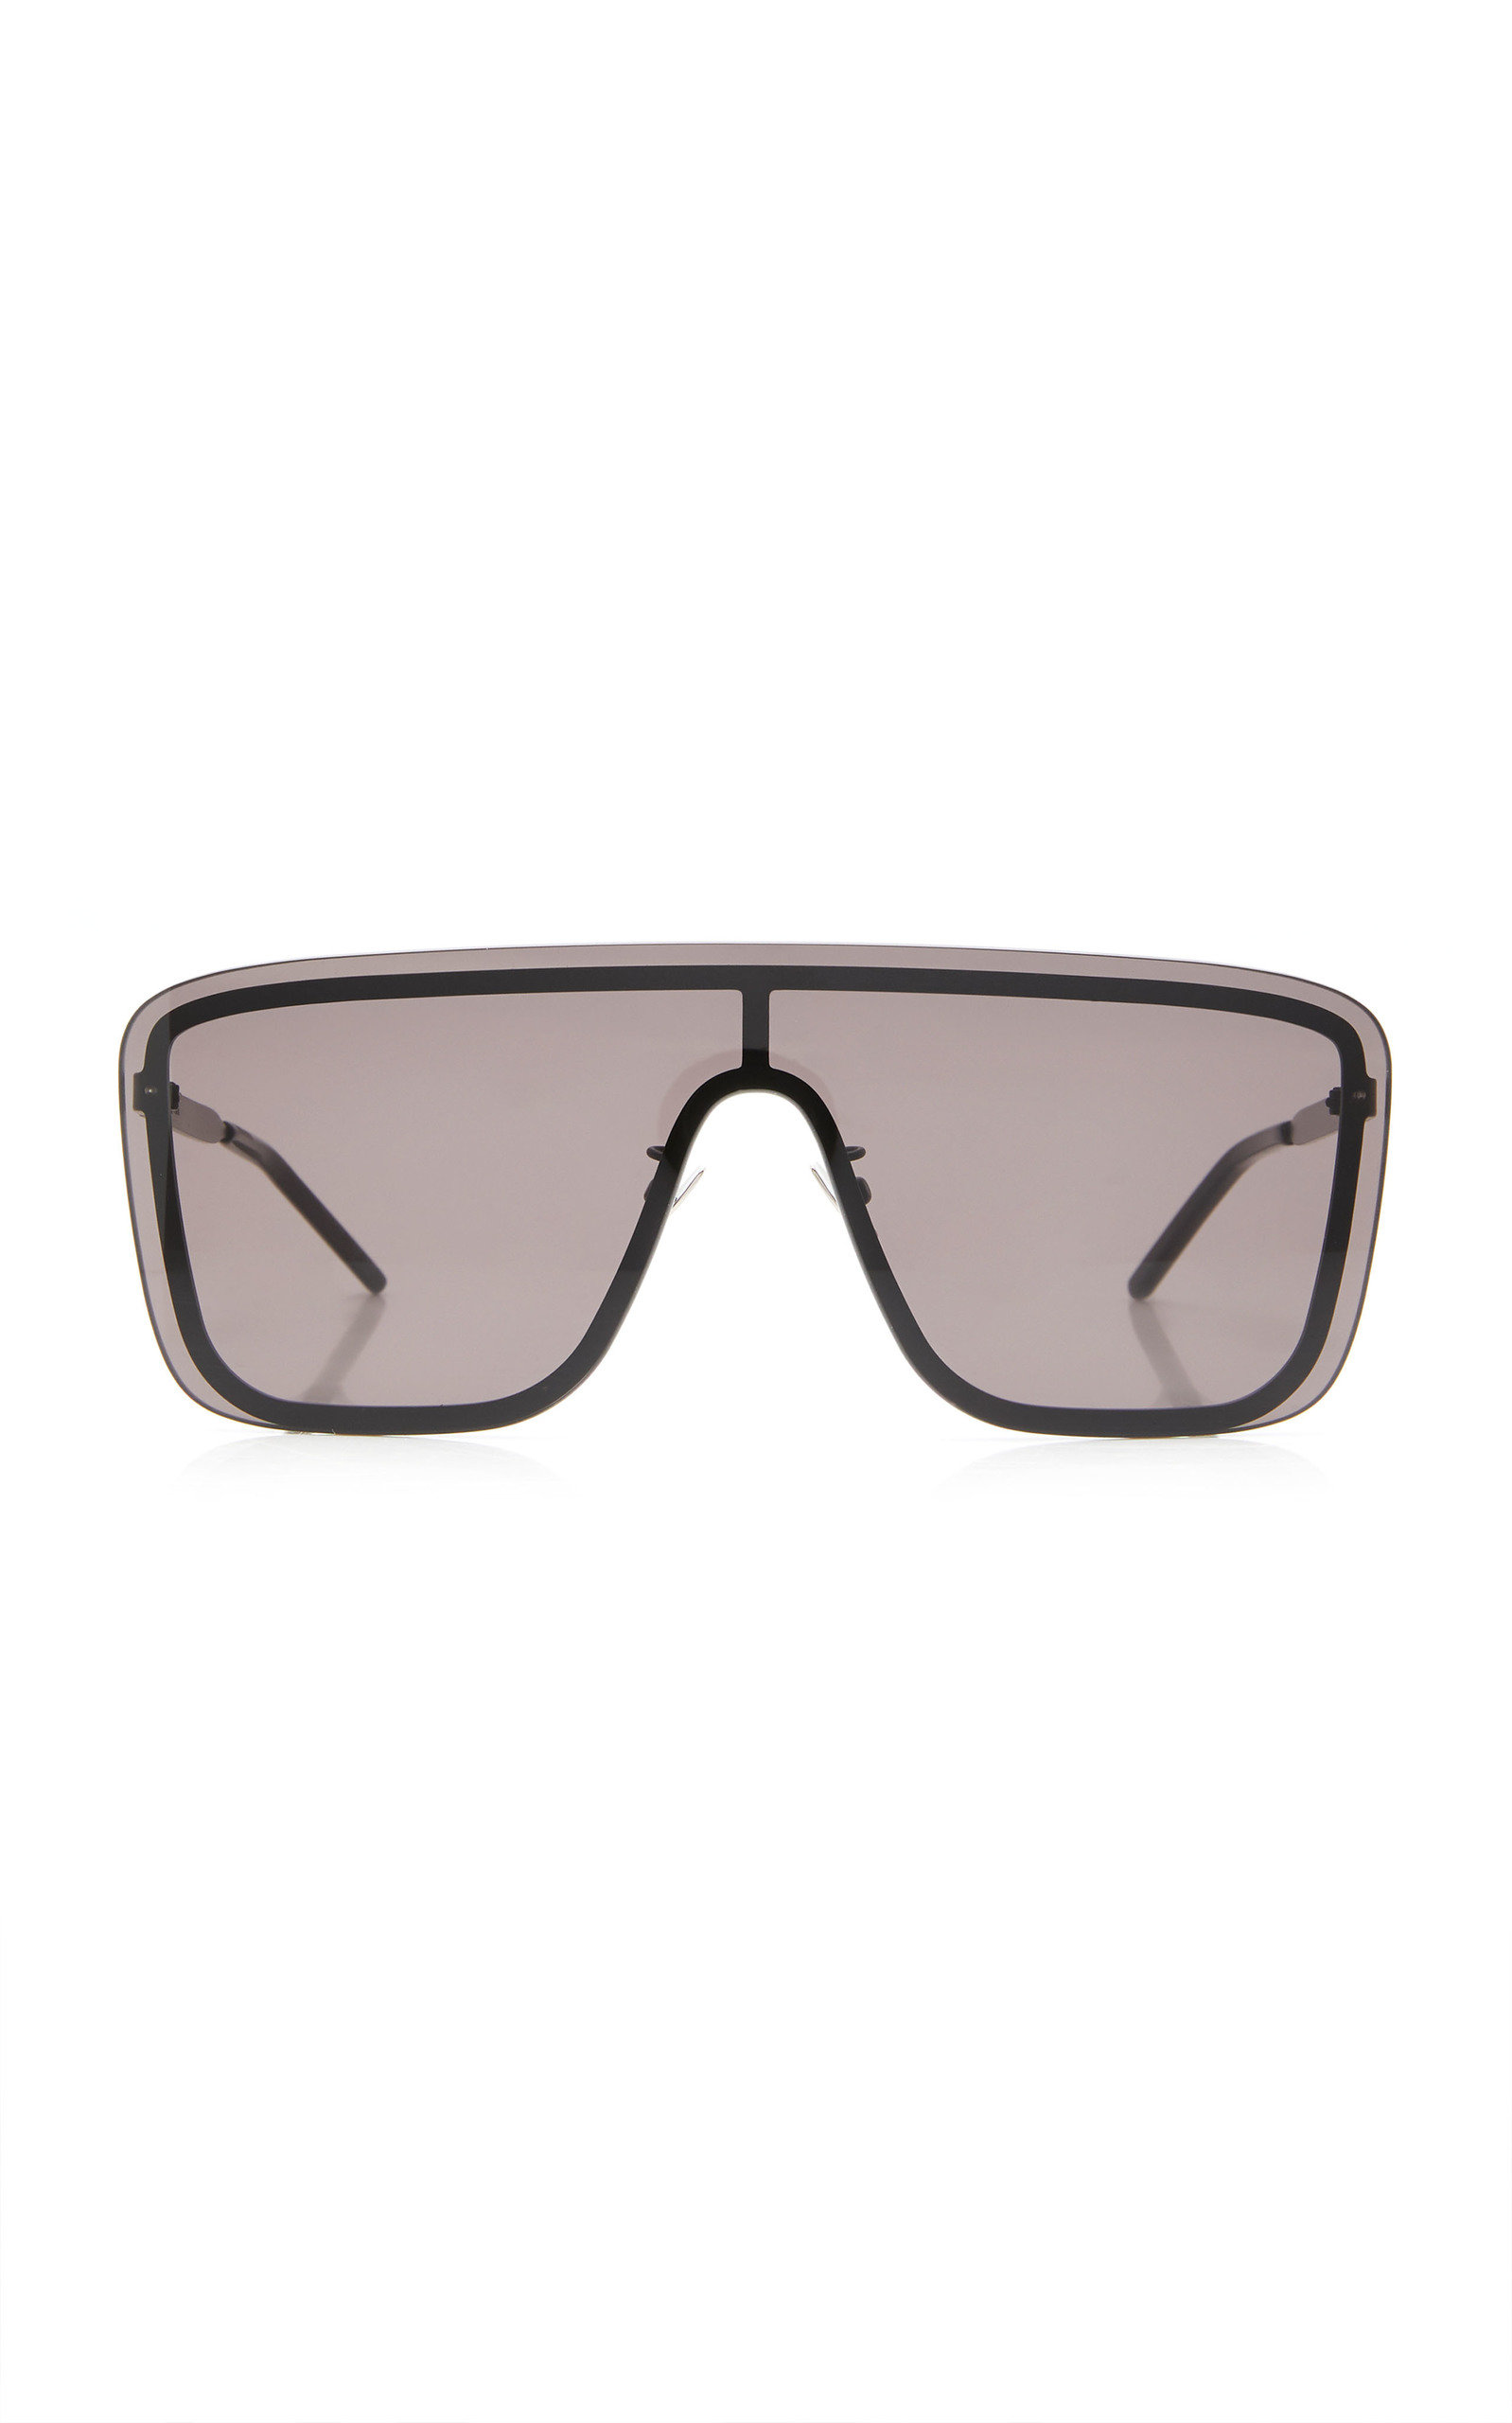 Saint Laurent - Women's Mask D-Frame Metal Sunglasses - Black/gold - Moda Operandi